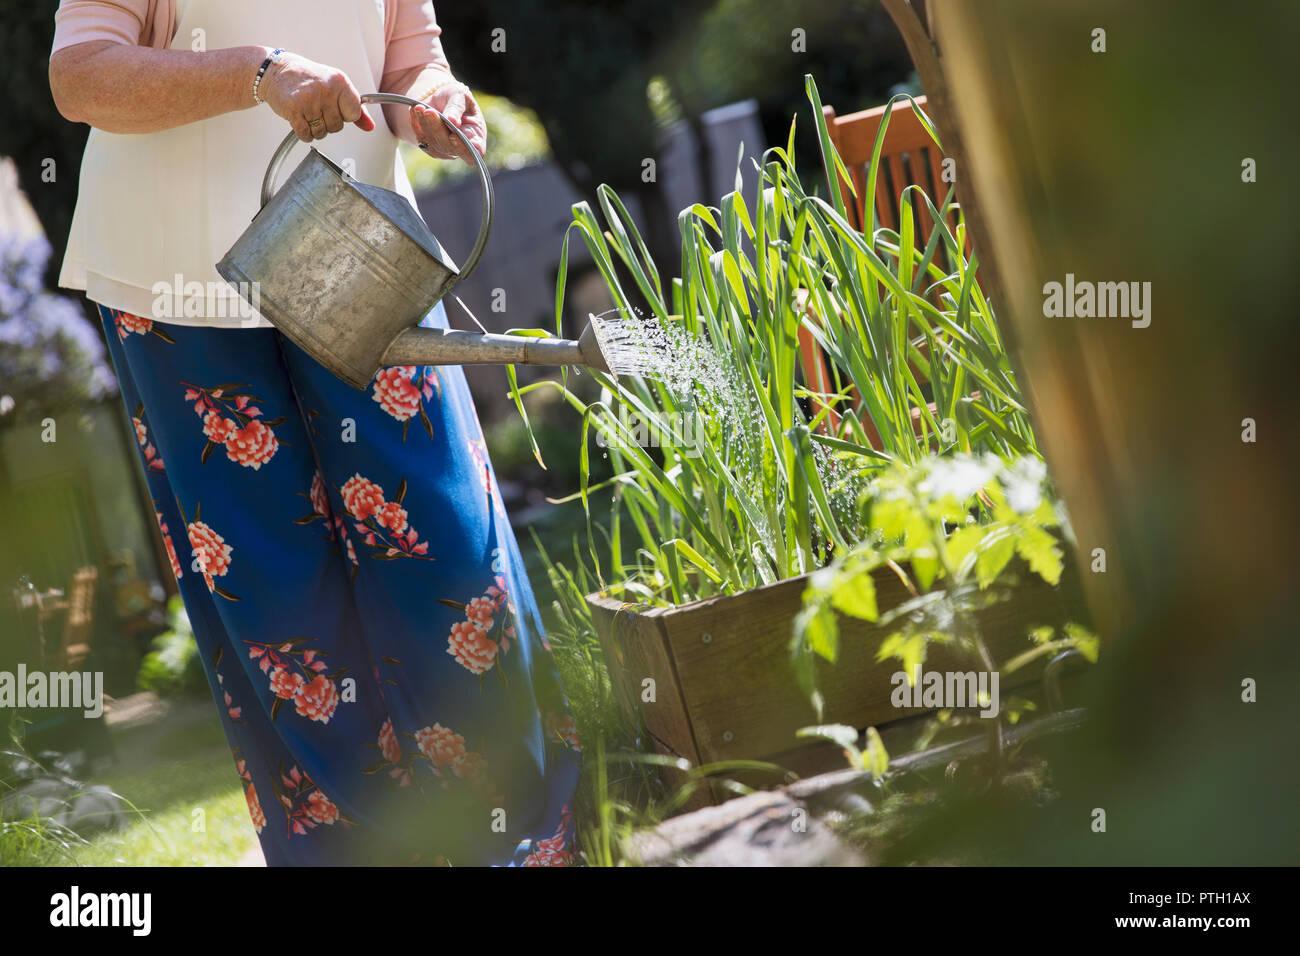 Woman gardening water plants - Stock Image